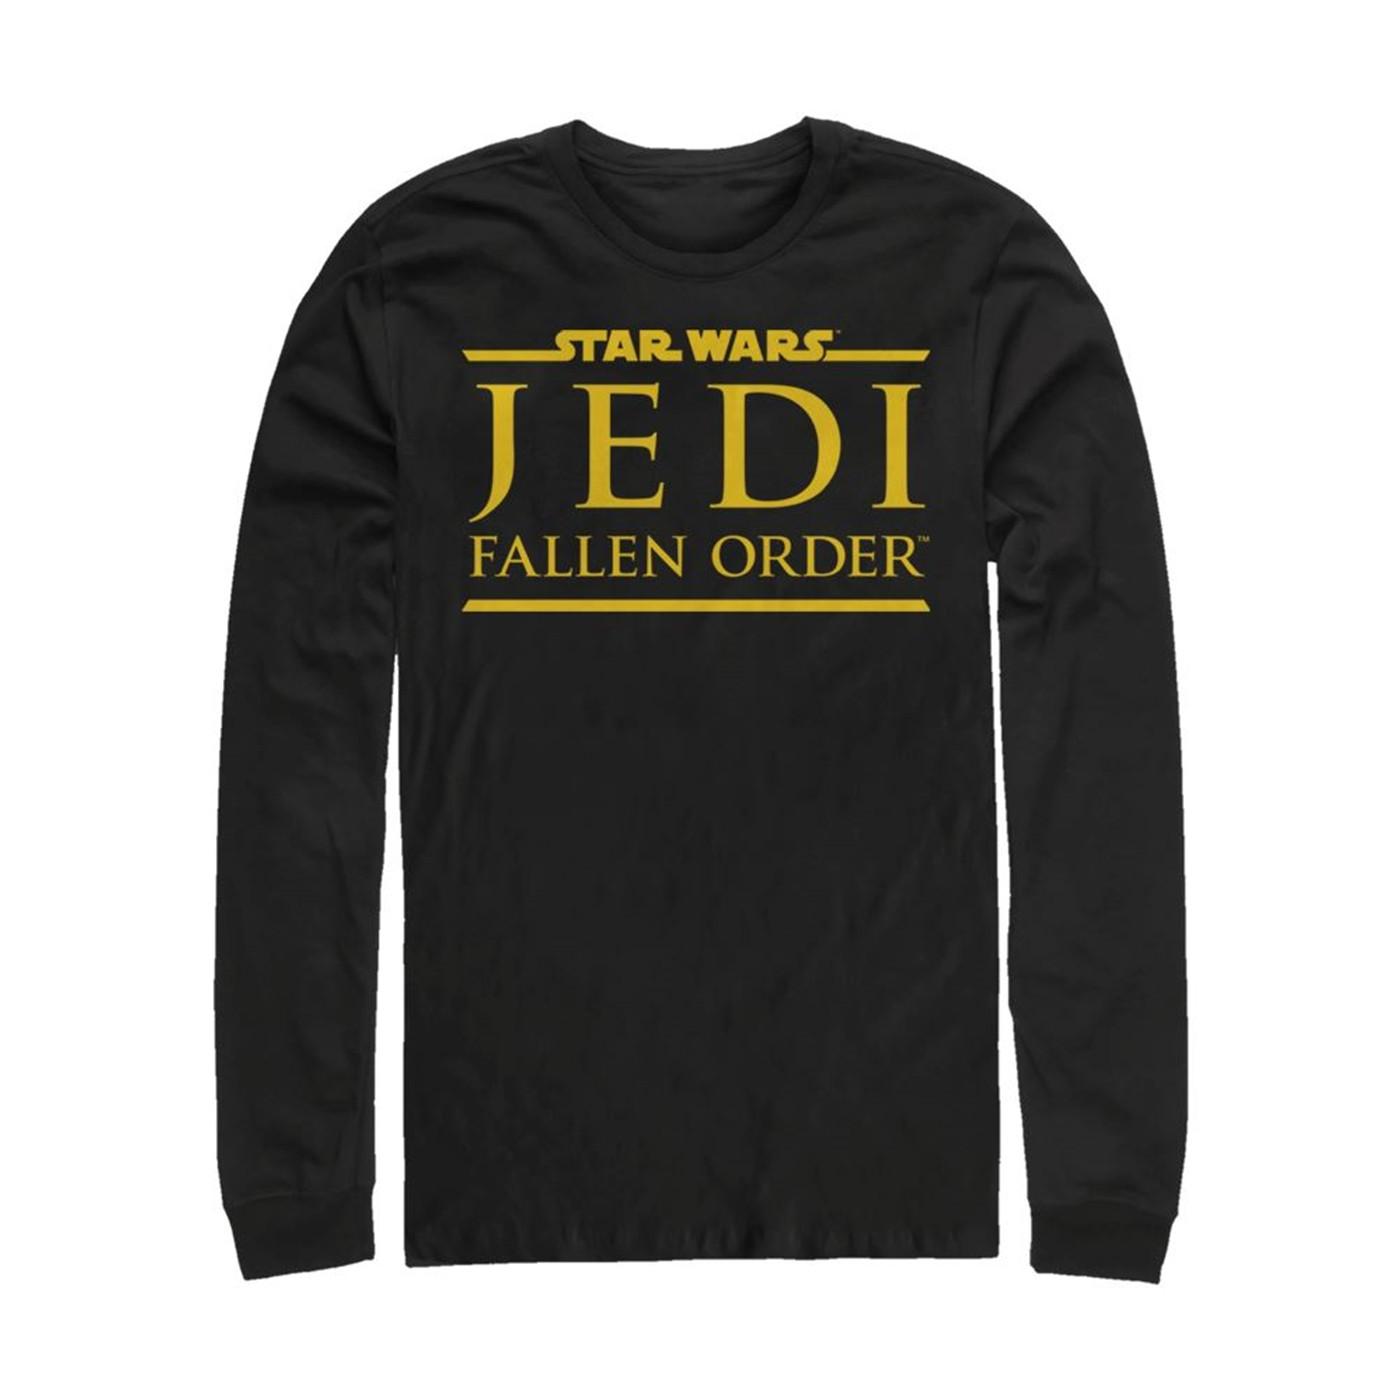 Star Wars Jedi Fallen Order Long Sleeve Shirt